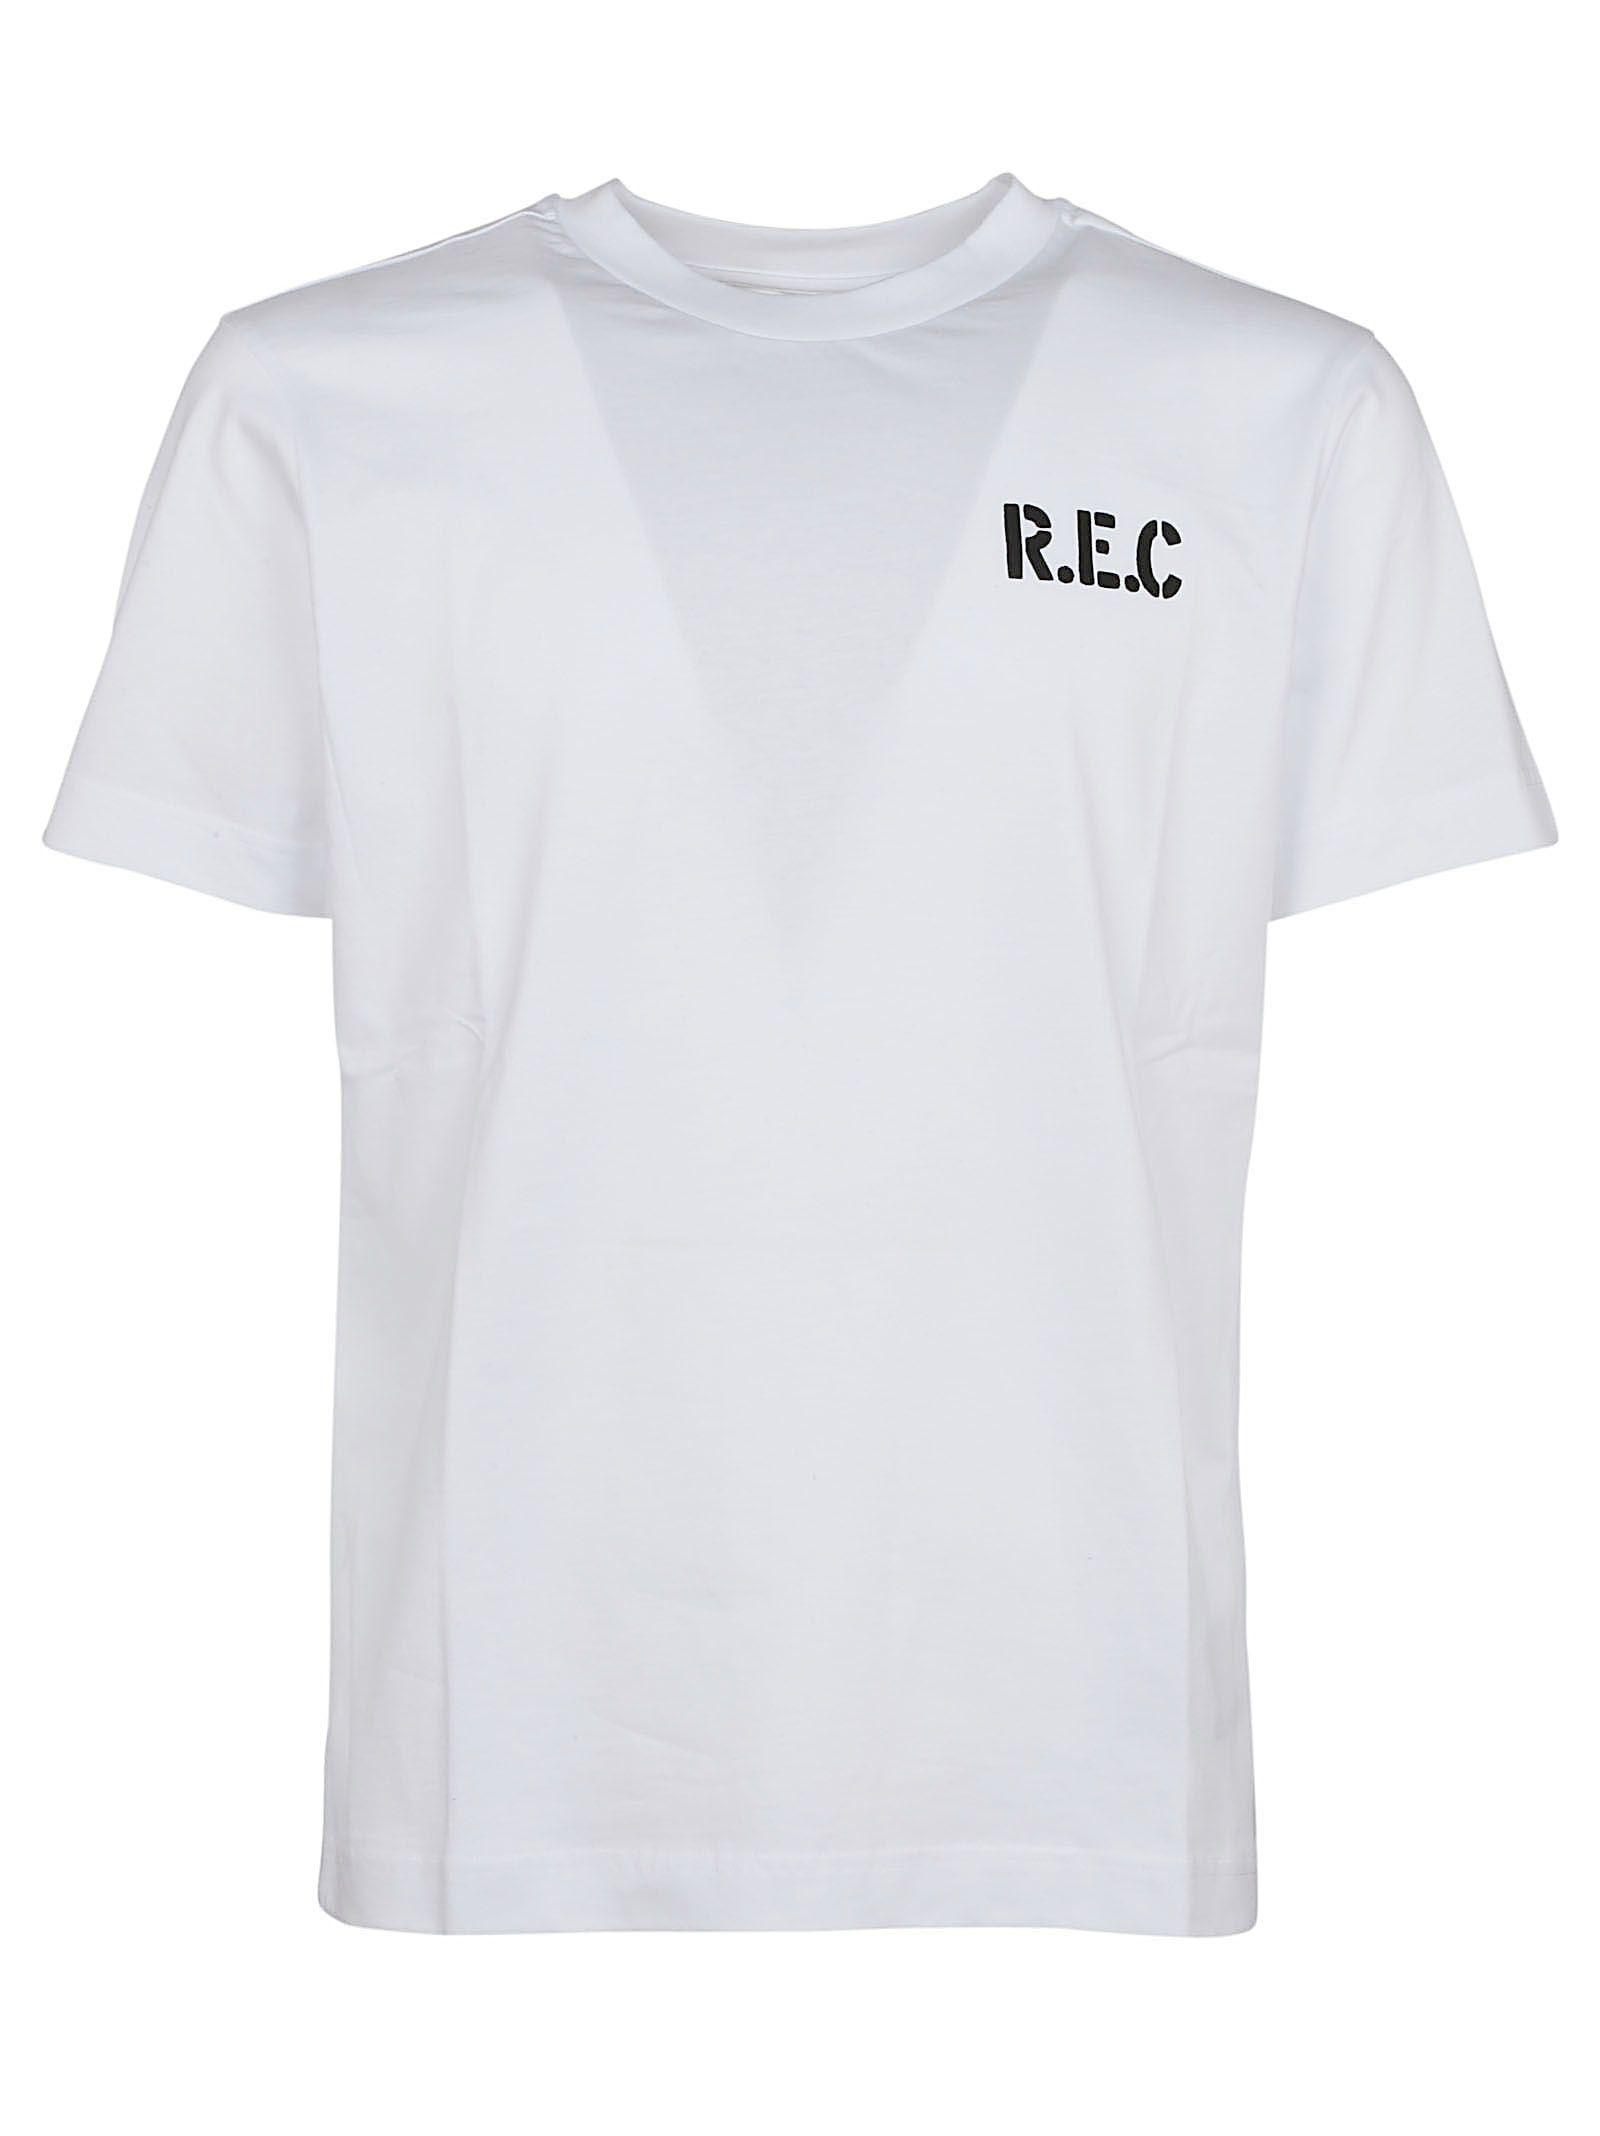 Palm Angels R.e.c T-shirt